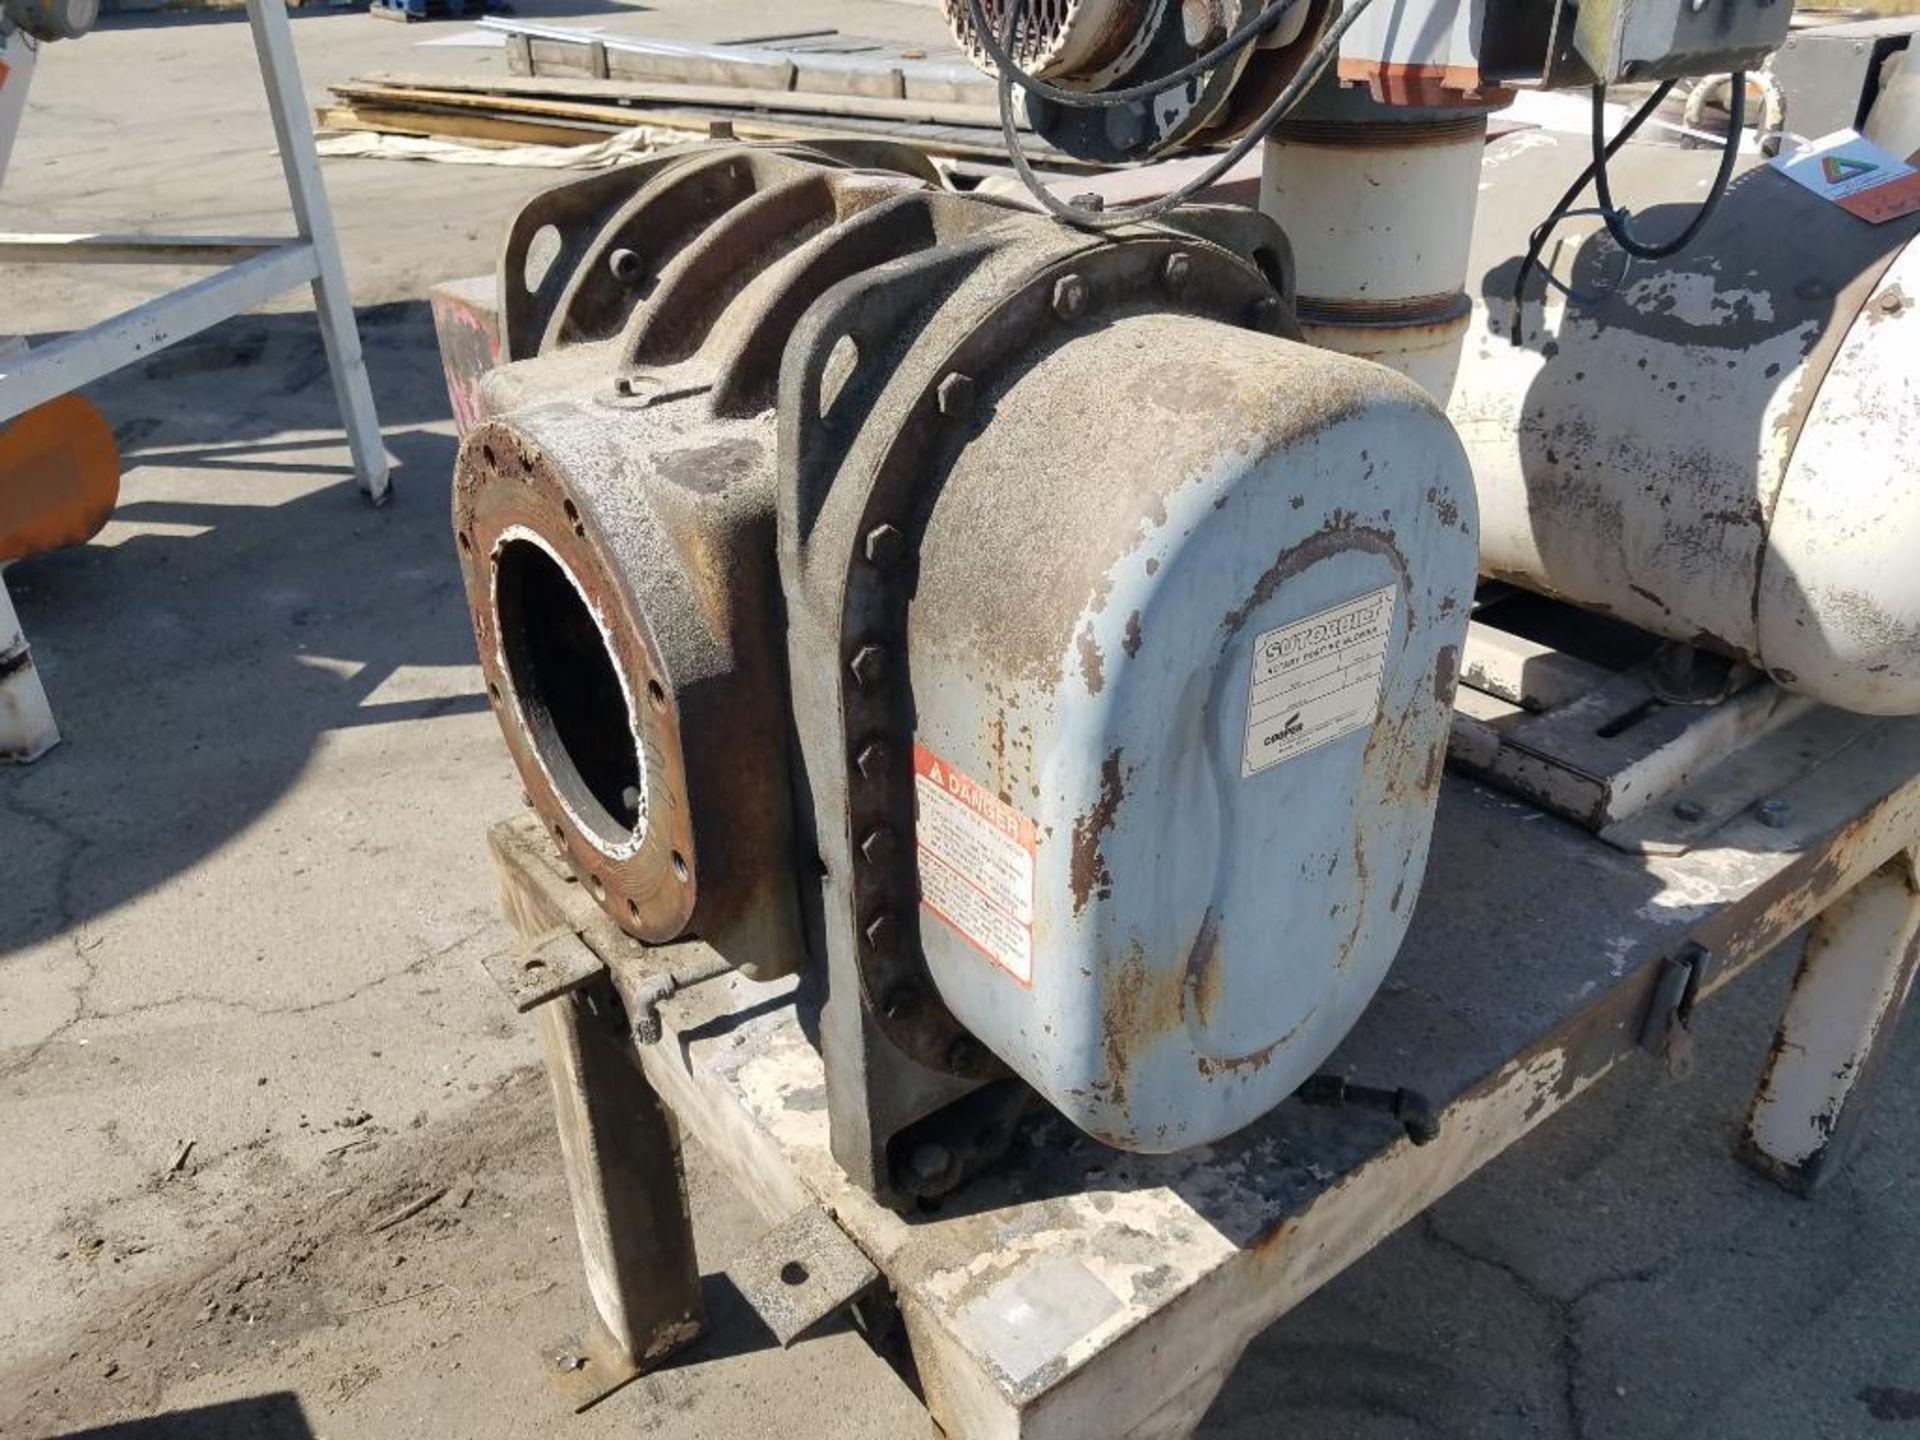 Sutorbilt rotary positive blower - Image 3 of 7